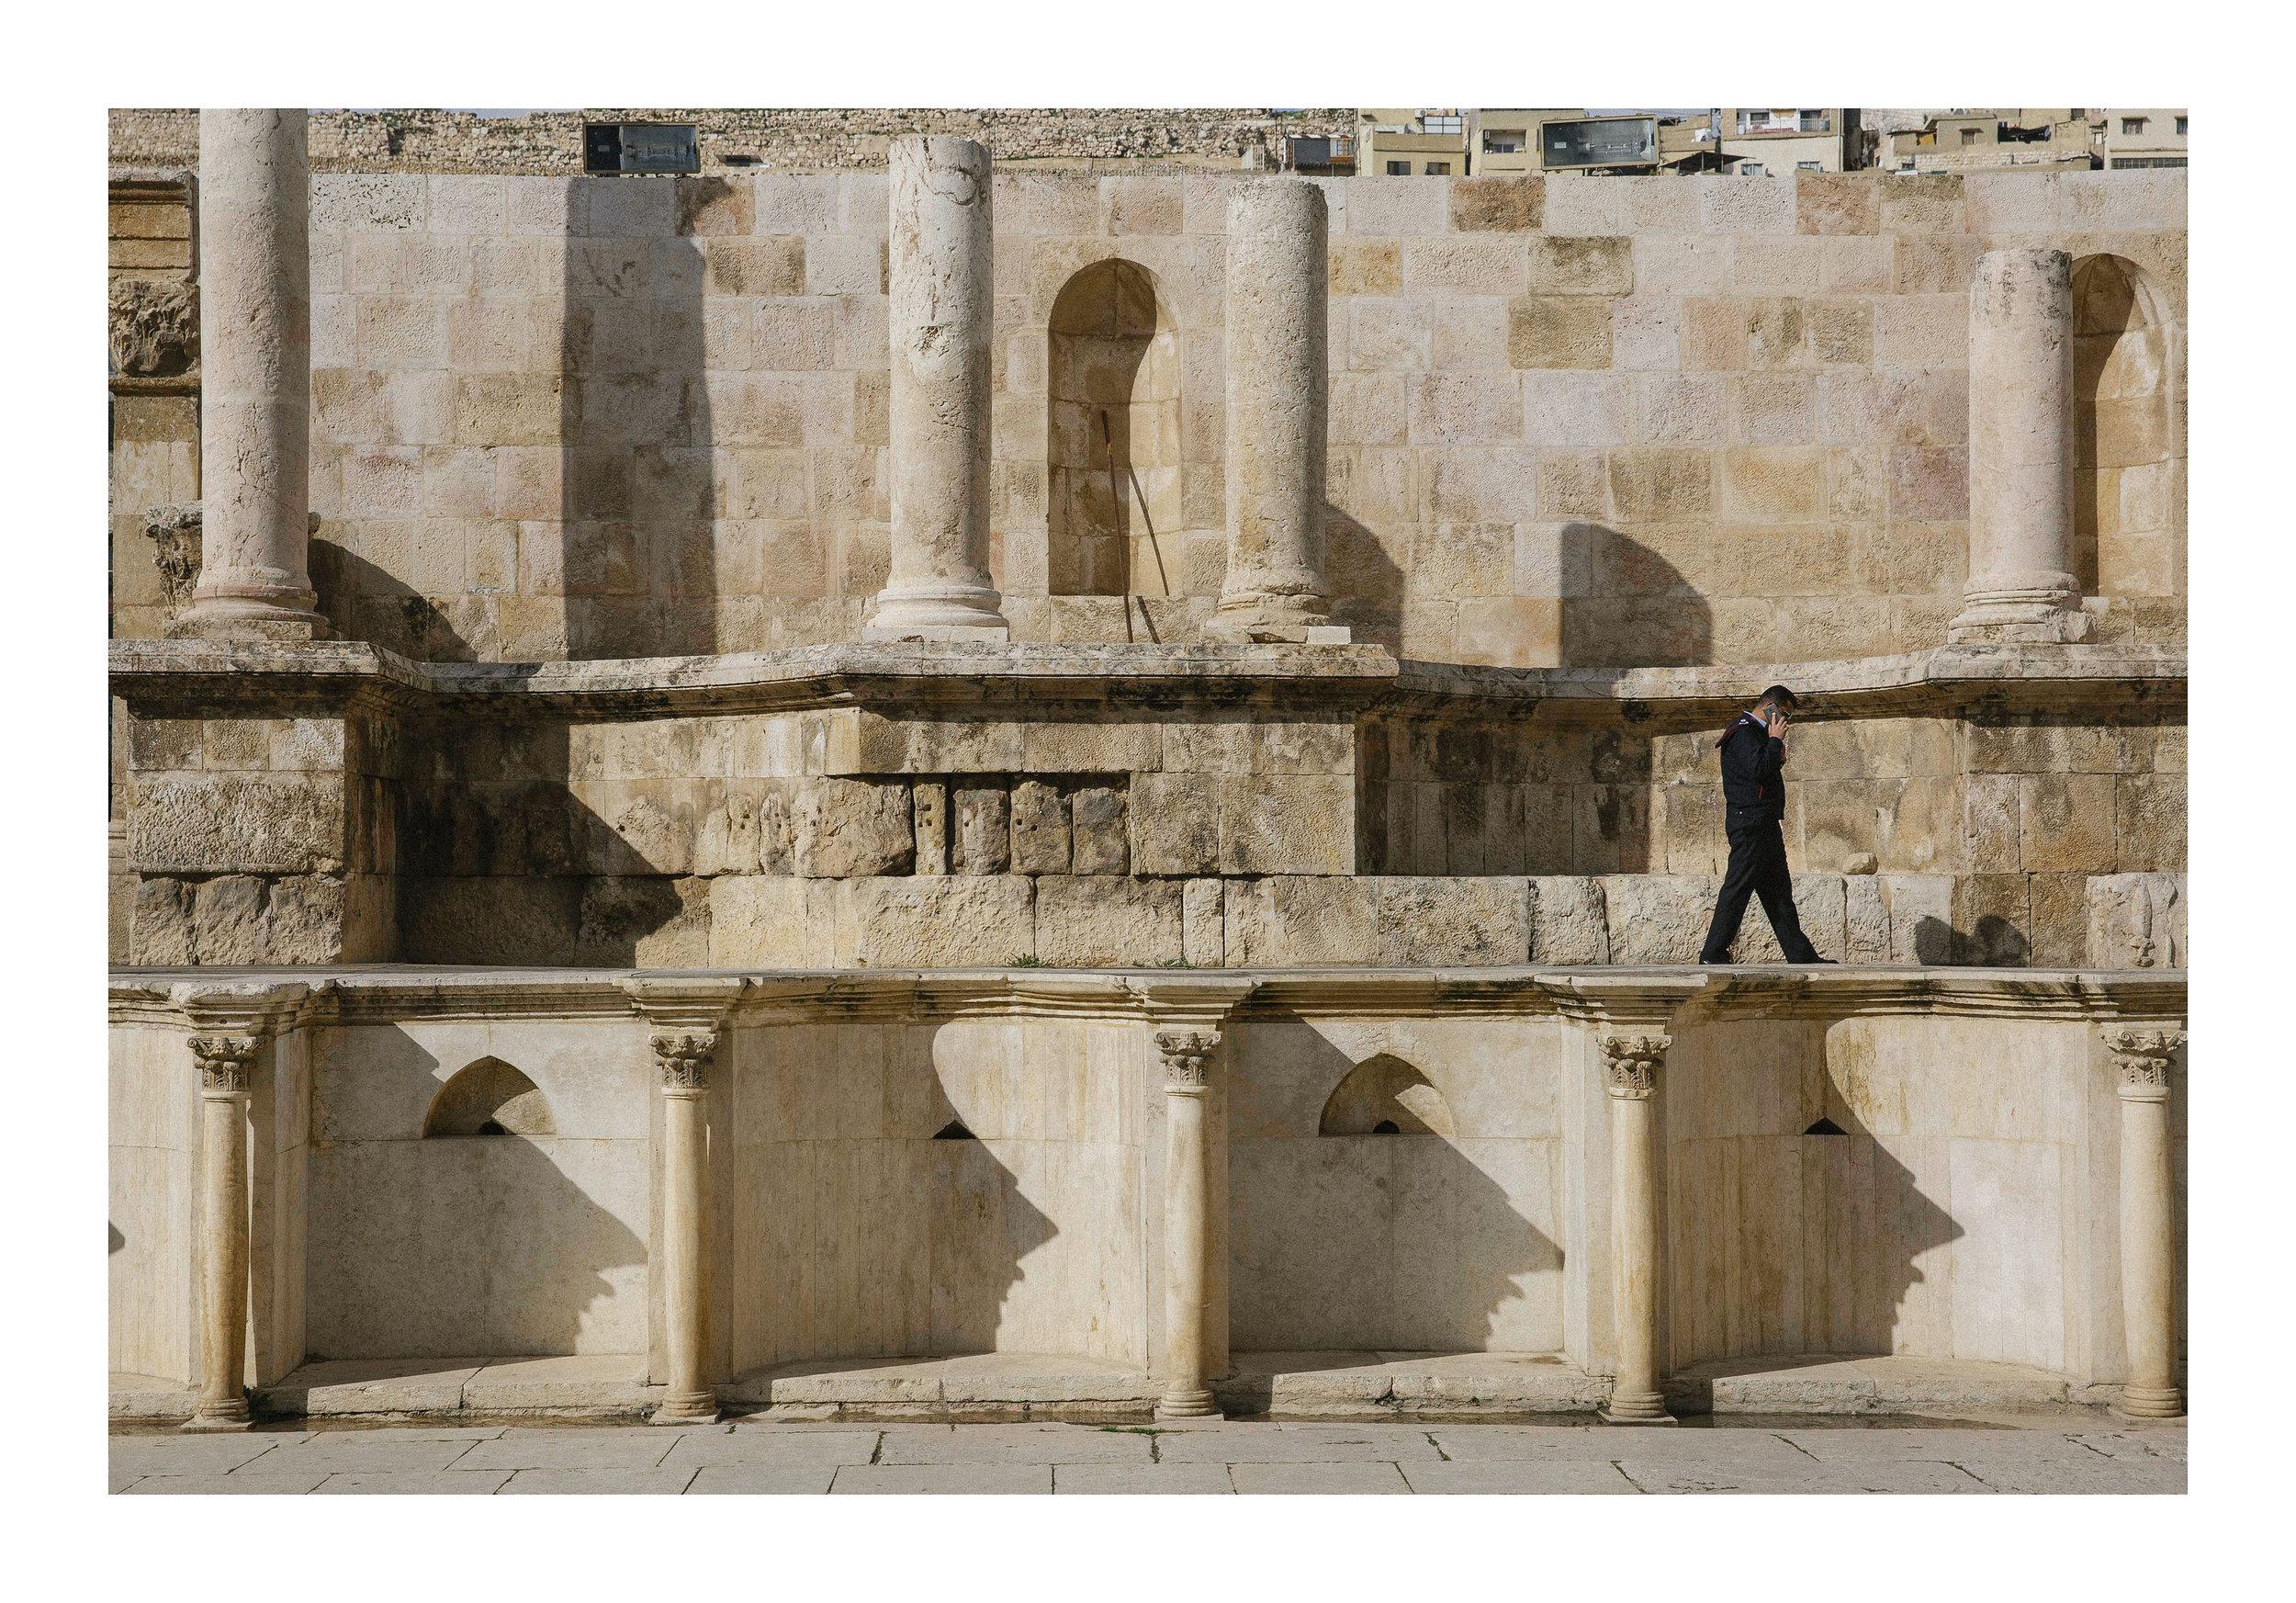 03 1902 JOR Amman 0250.JPG